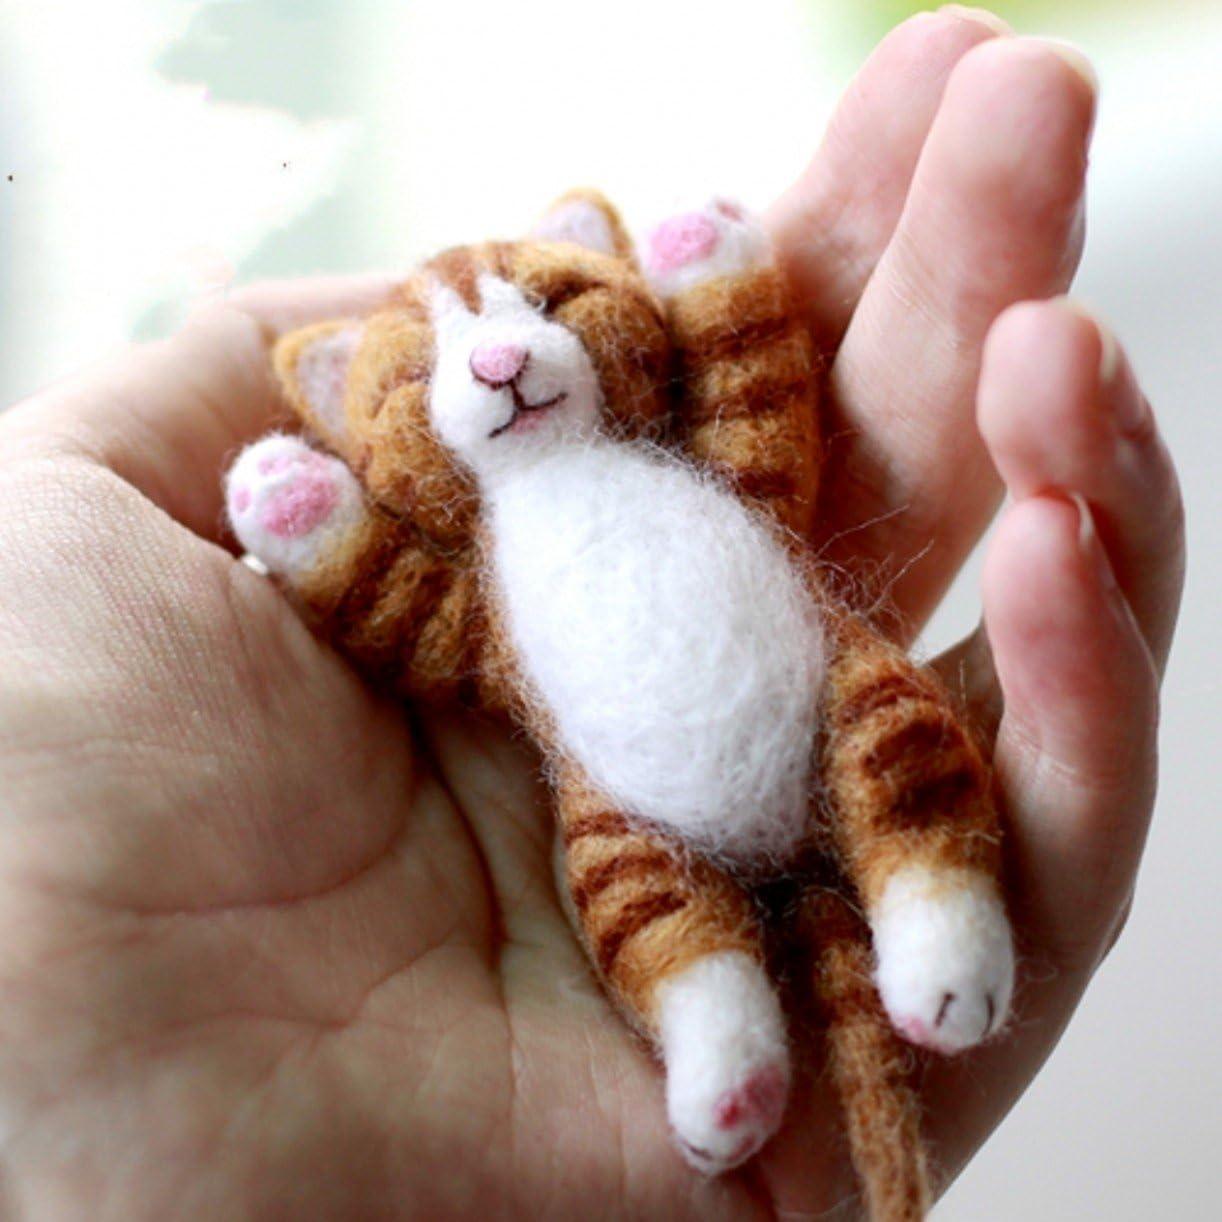 WellieSTR 4 Stlye Animal Natural Wool Roving Needlecrafts Needle Felted Felting Character Starter Kit